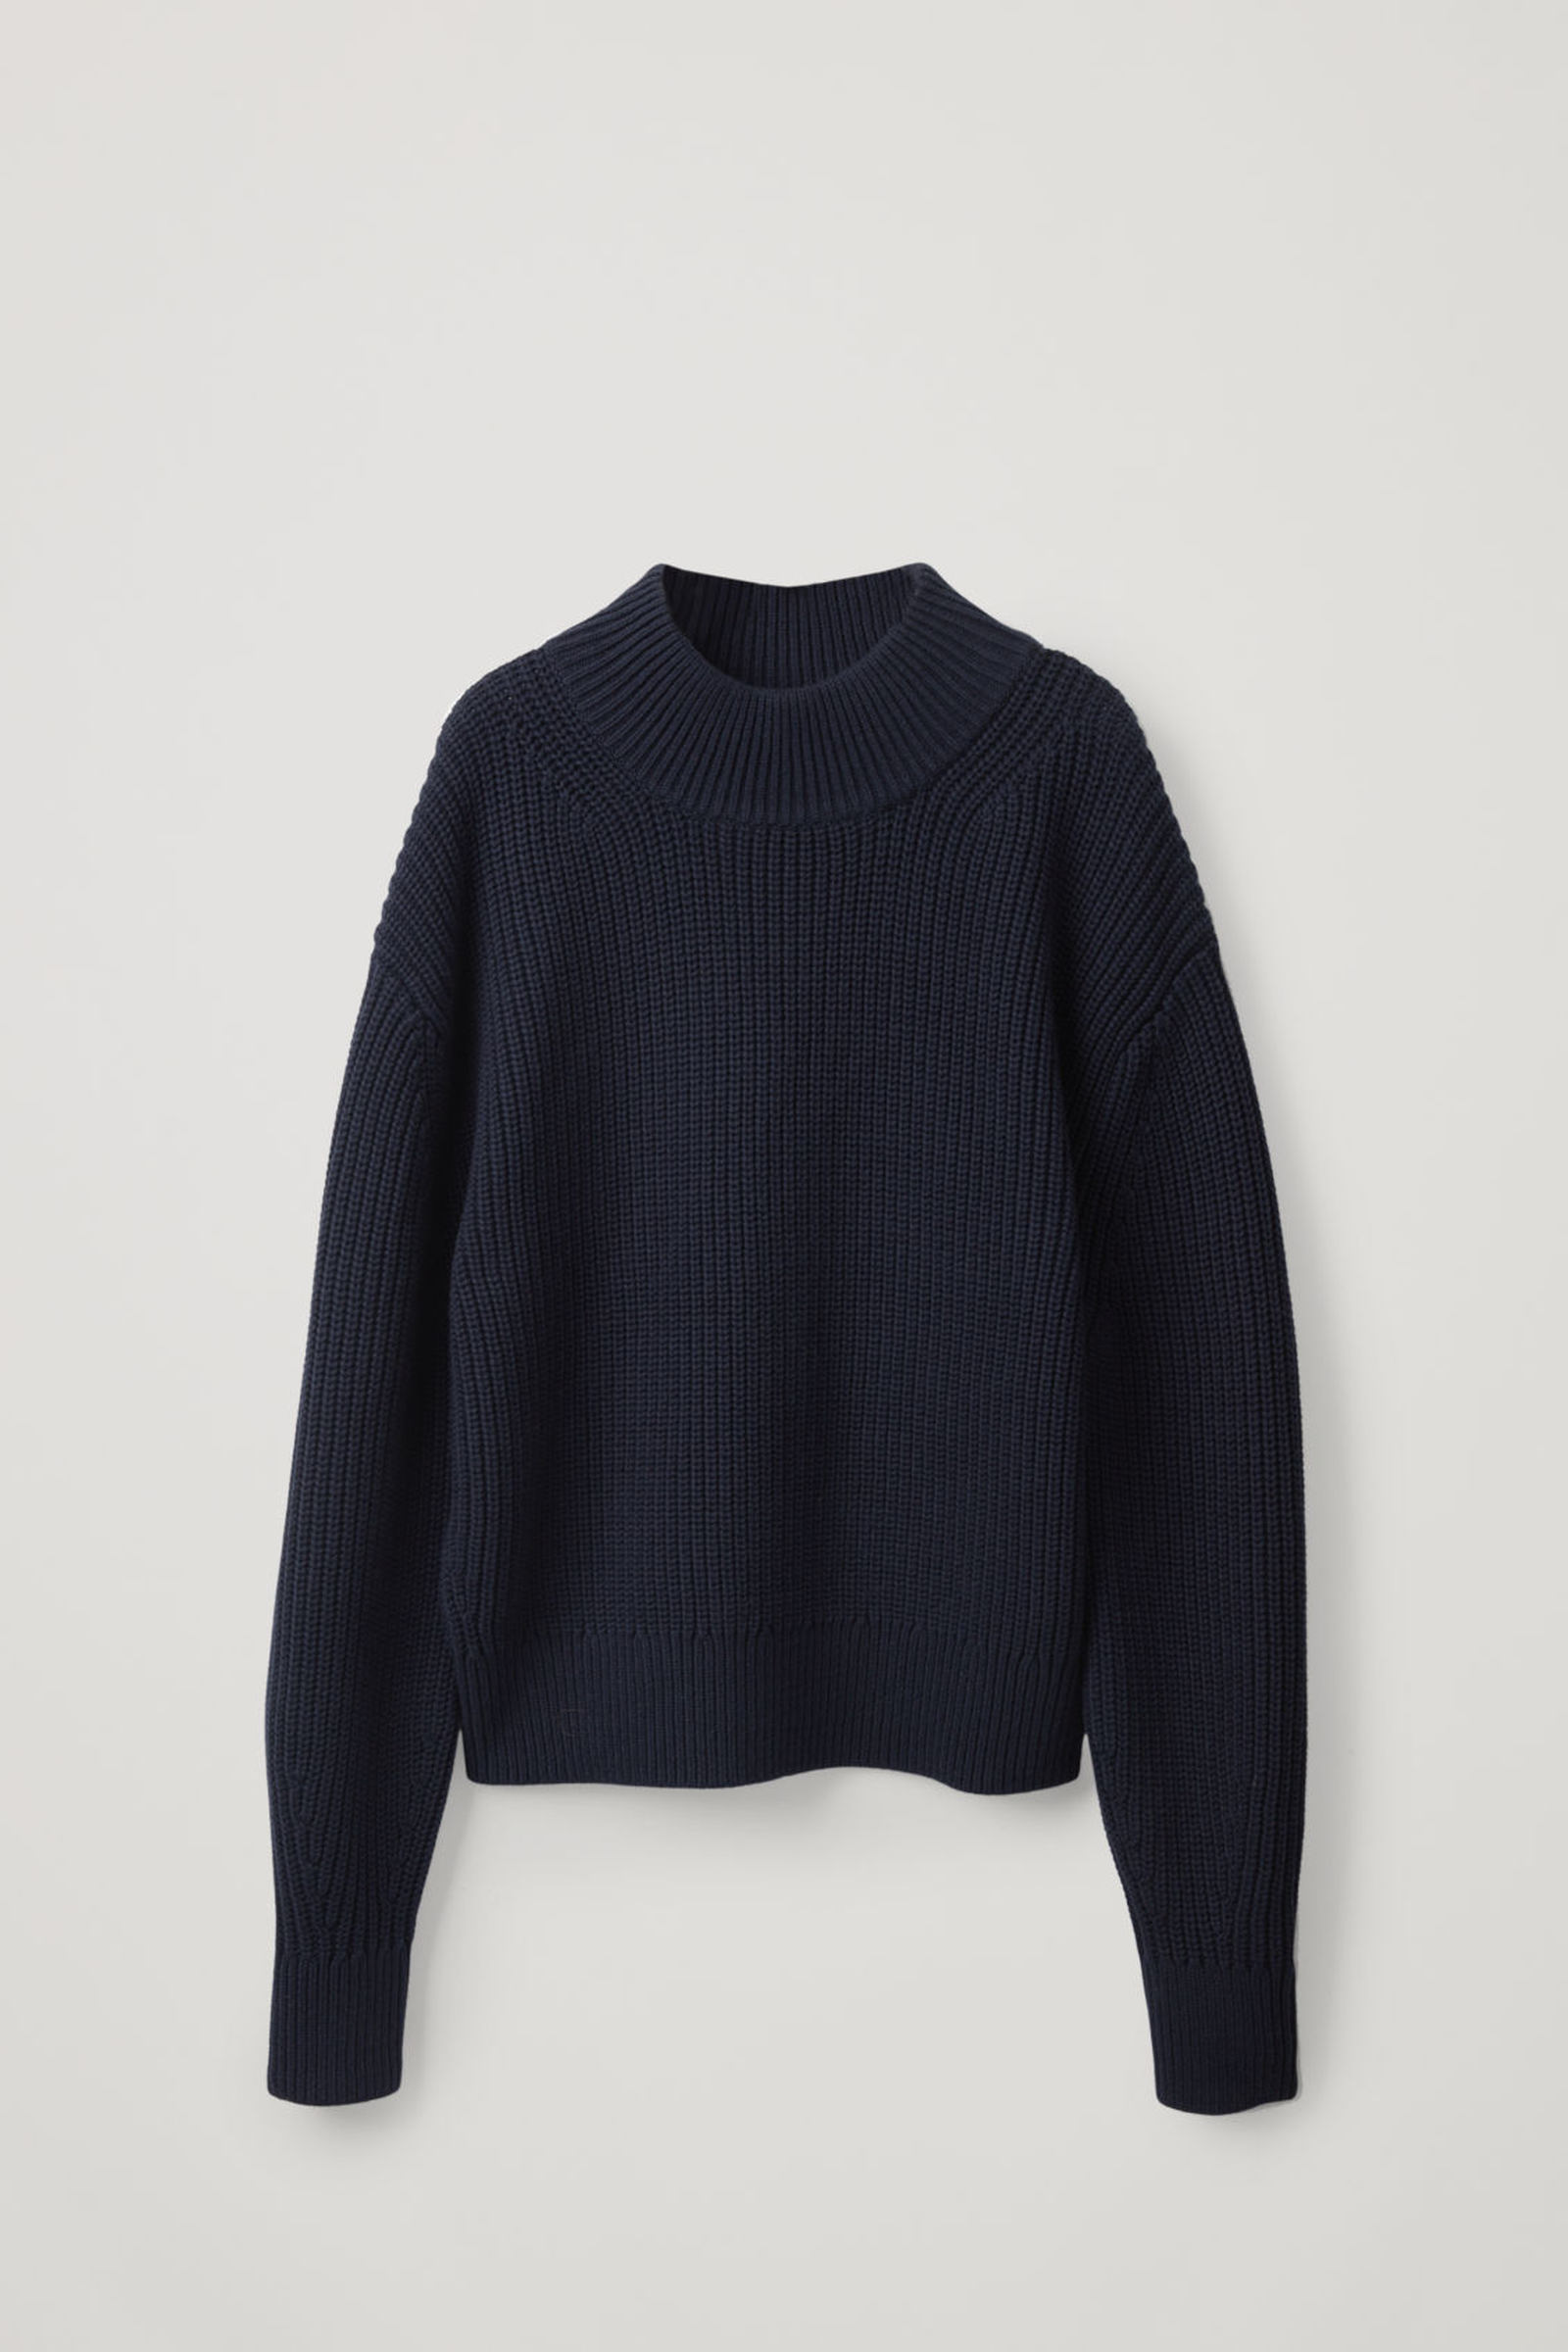 COS 울 코튼 니티드 스웨터의 네이비컬러 Product입니다.